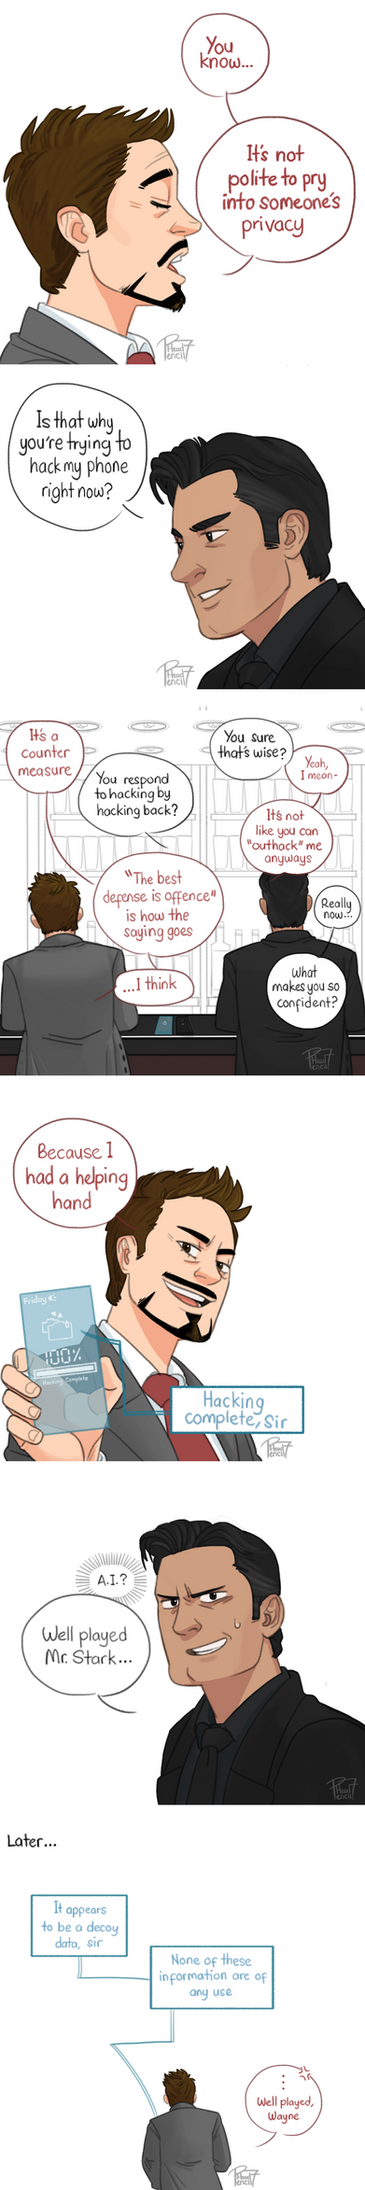 Stark vs Wayne by pencilHead7